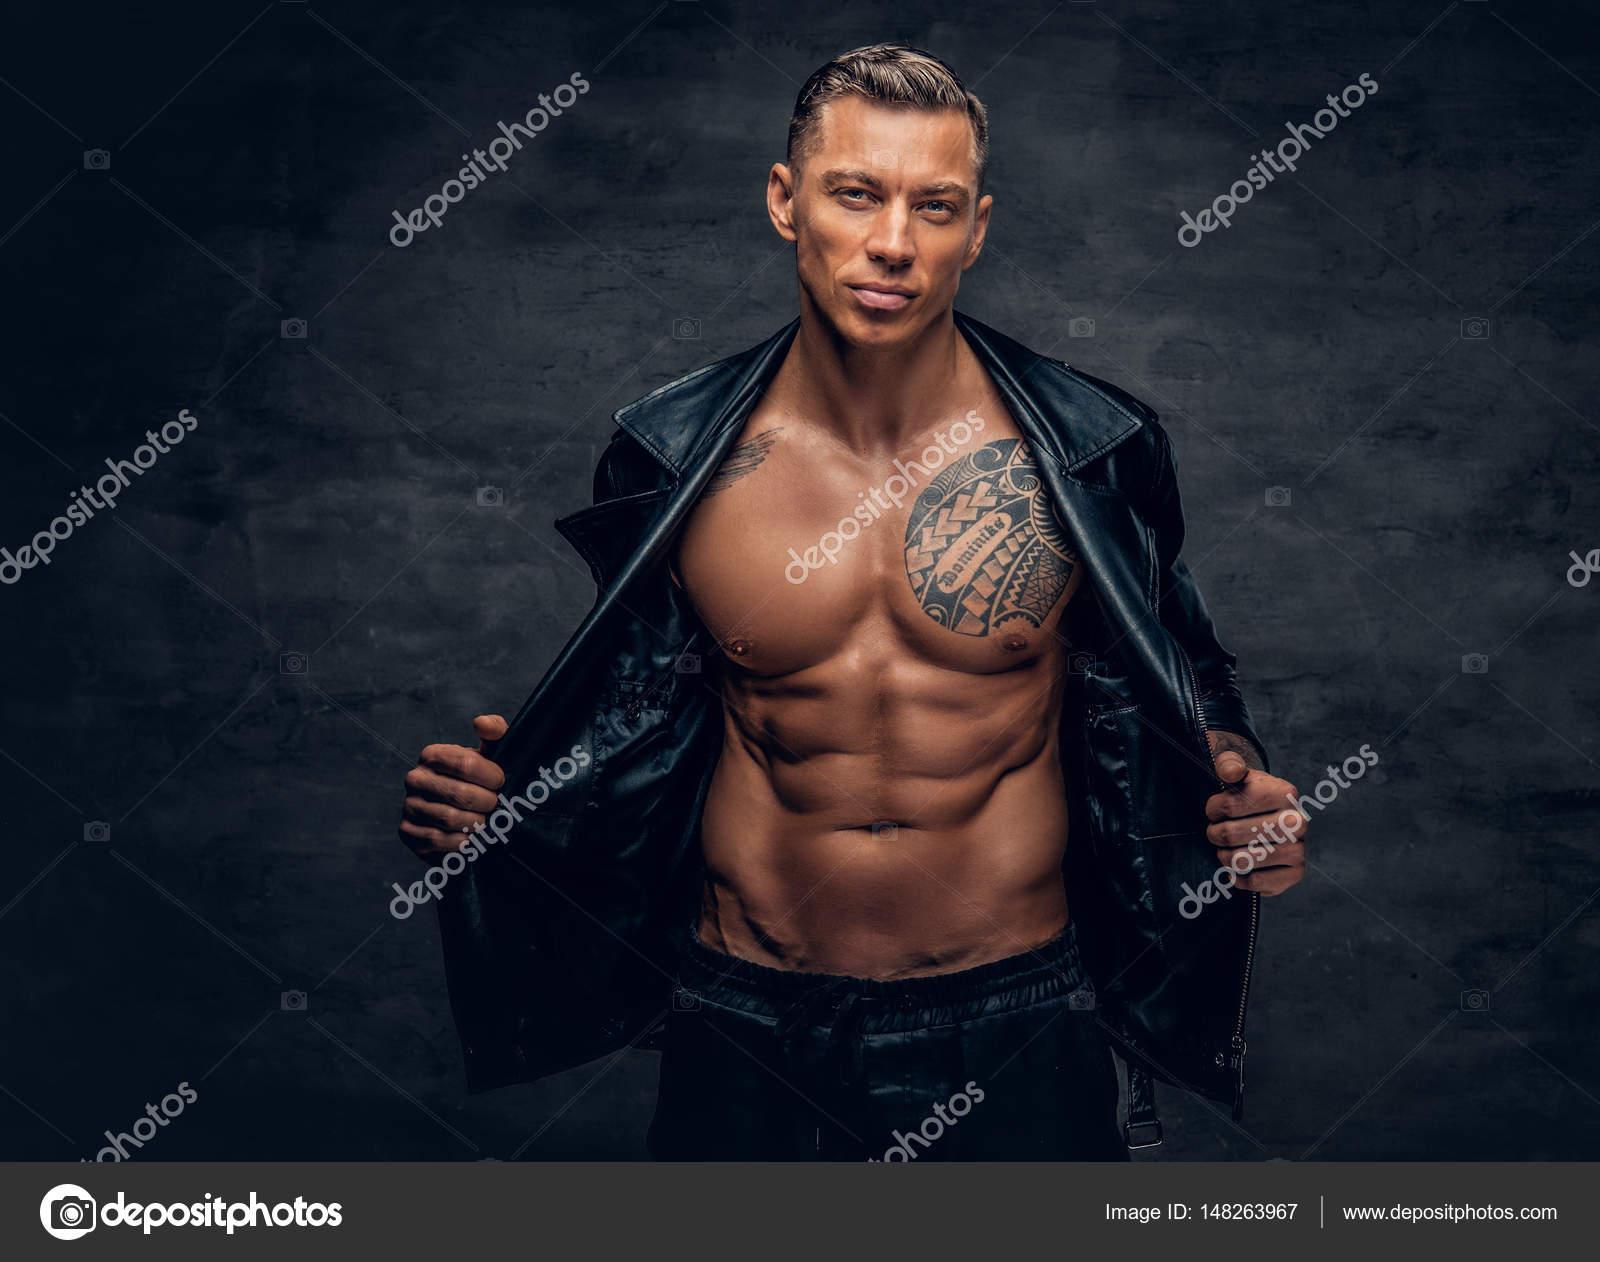 Tatuajes Guapos Para Hombres tatuajes guapos en el pecho | hombre guapo con tatuajes en un pecho